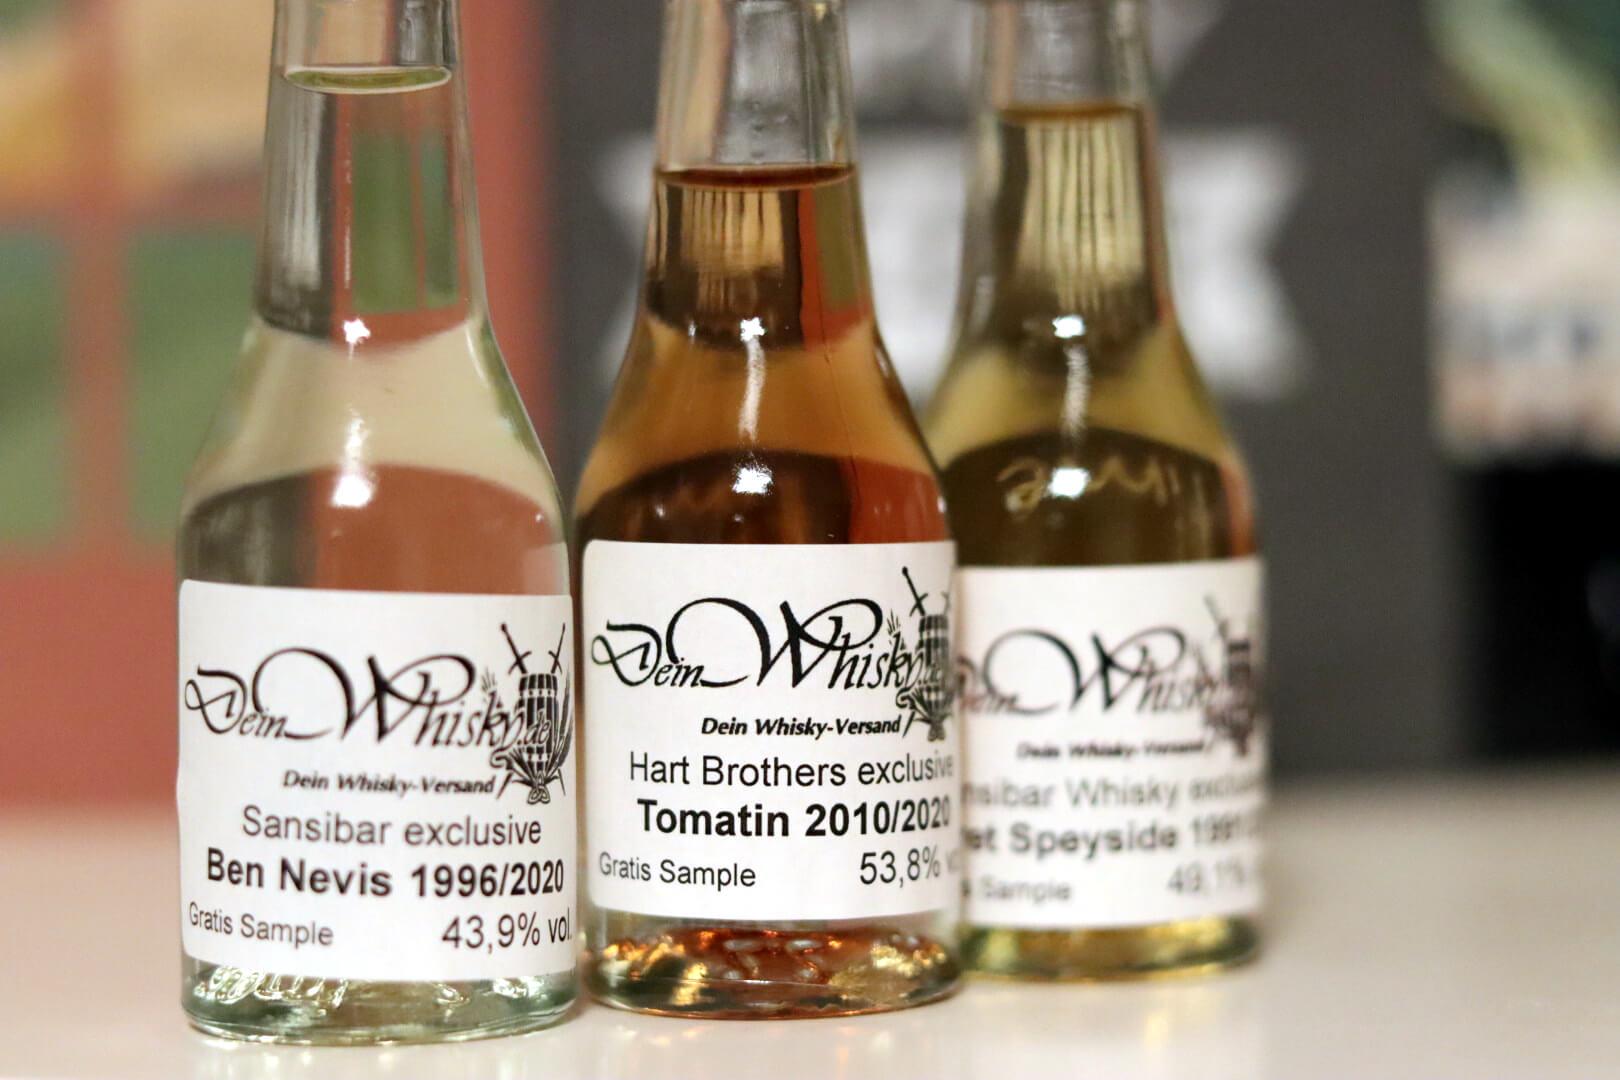 Whiskybesprechung #195: 3x deinwhisky.de (Ben Nevis, Secret Speyside, Tomatin)